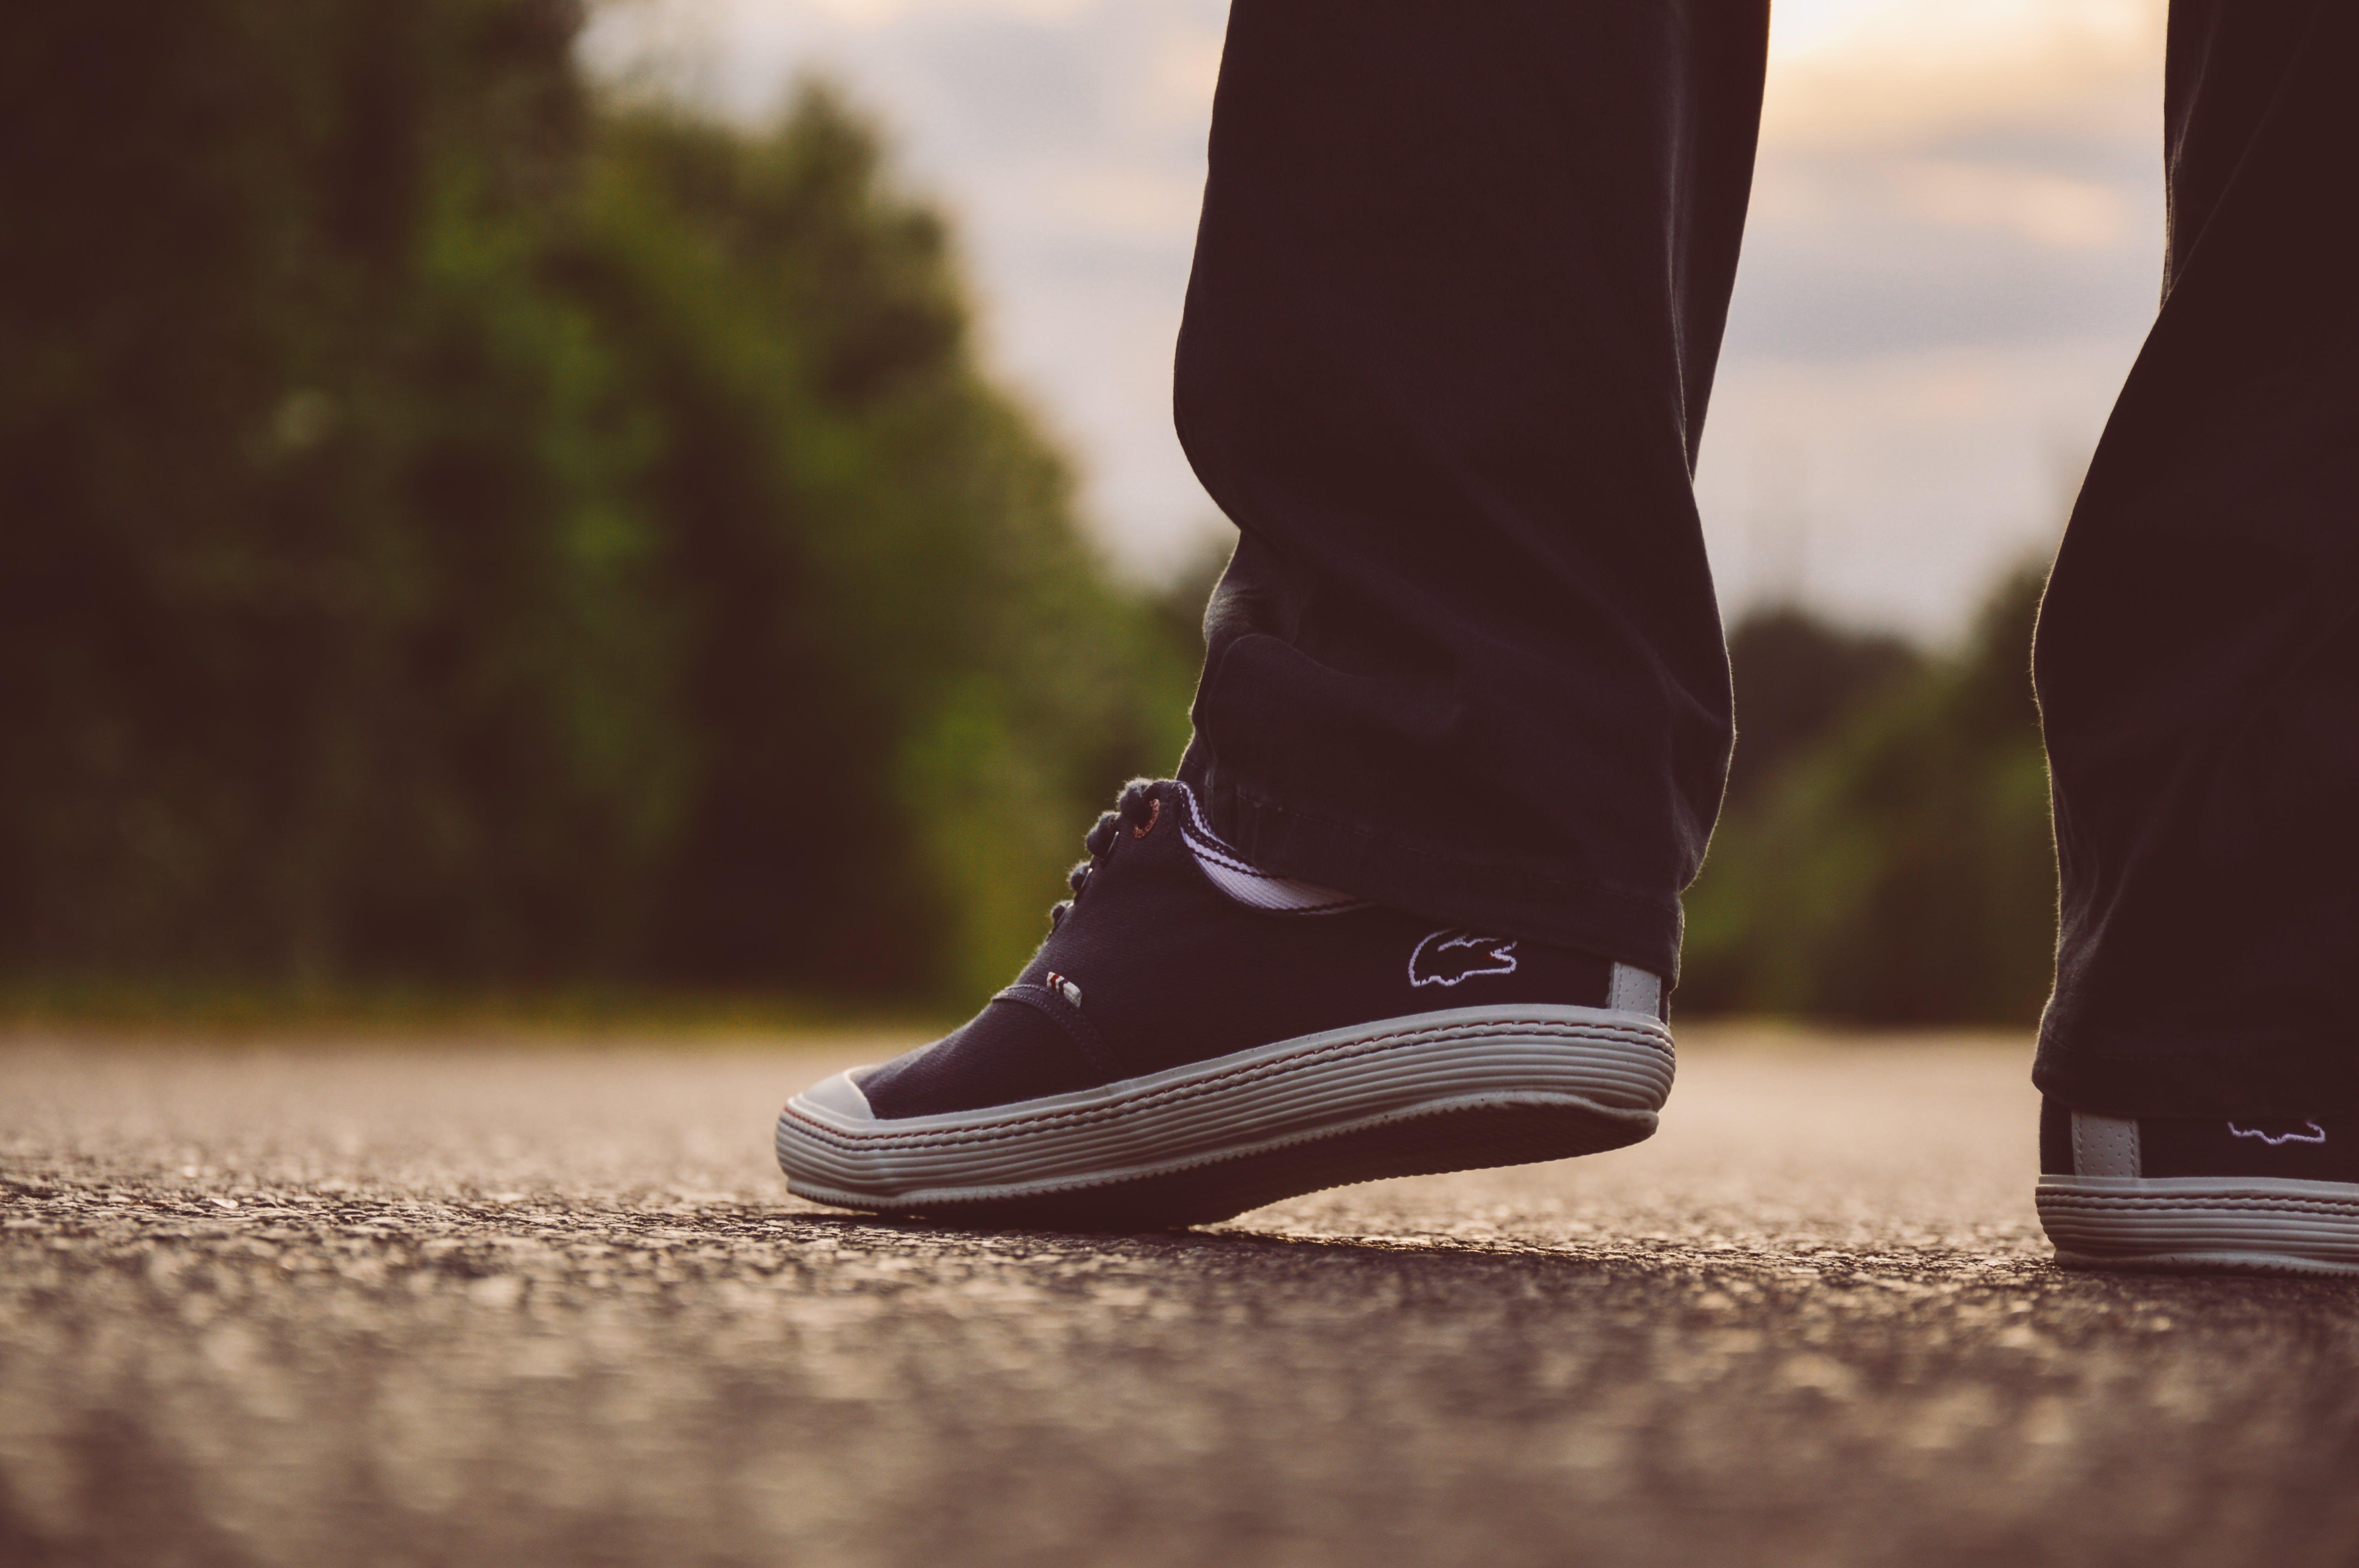 Free stock photo of fashion, shoes, ground, pavement